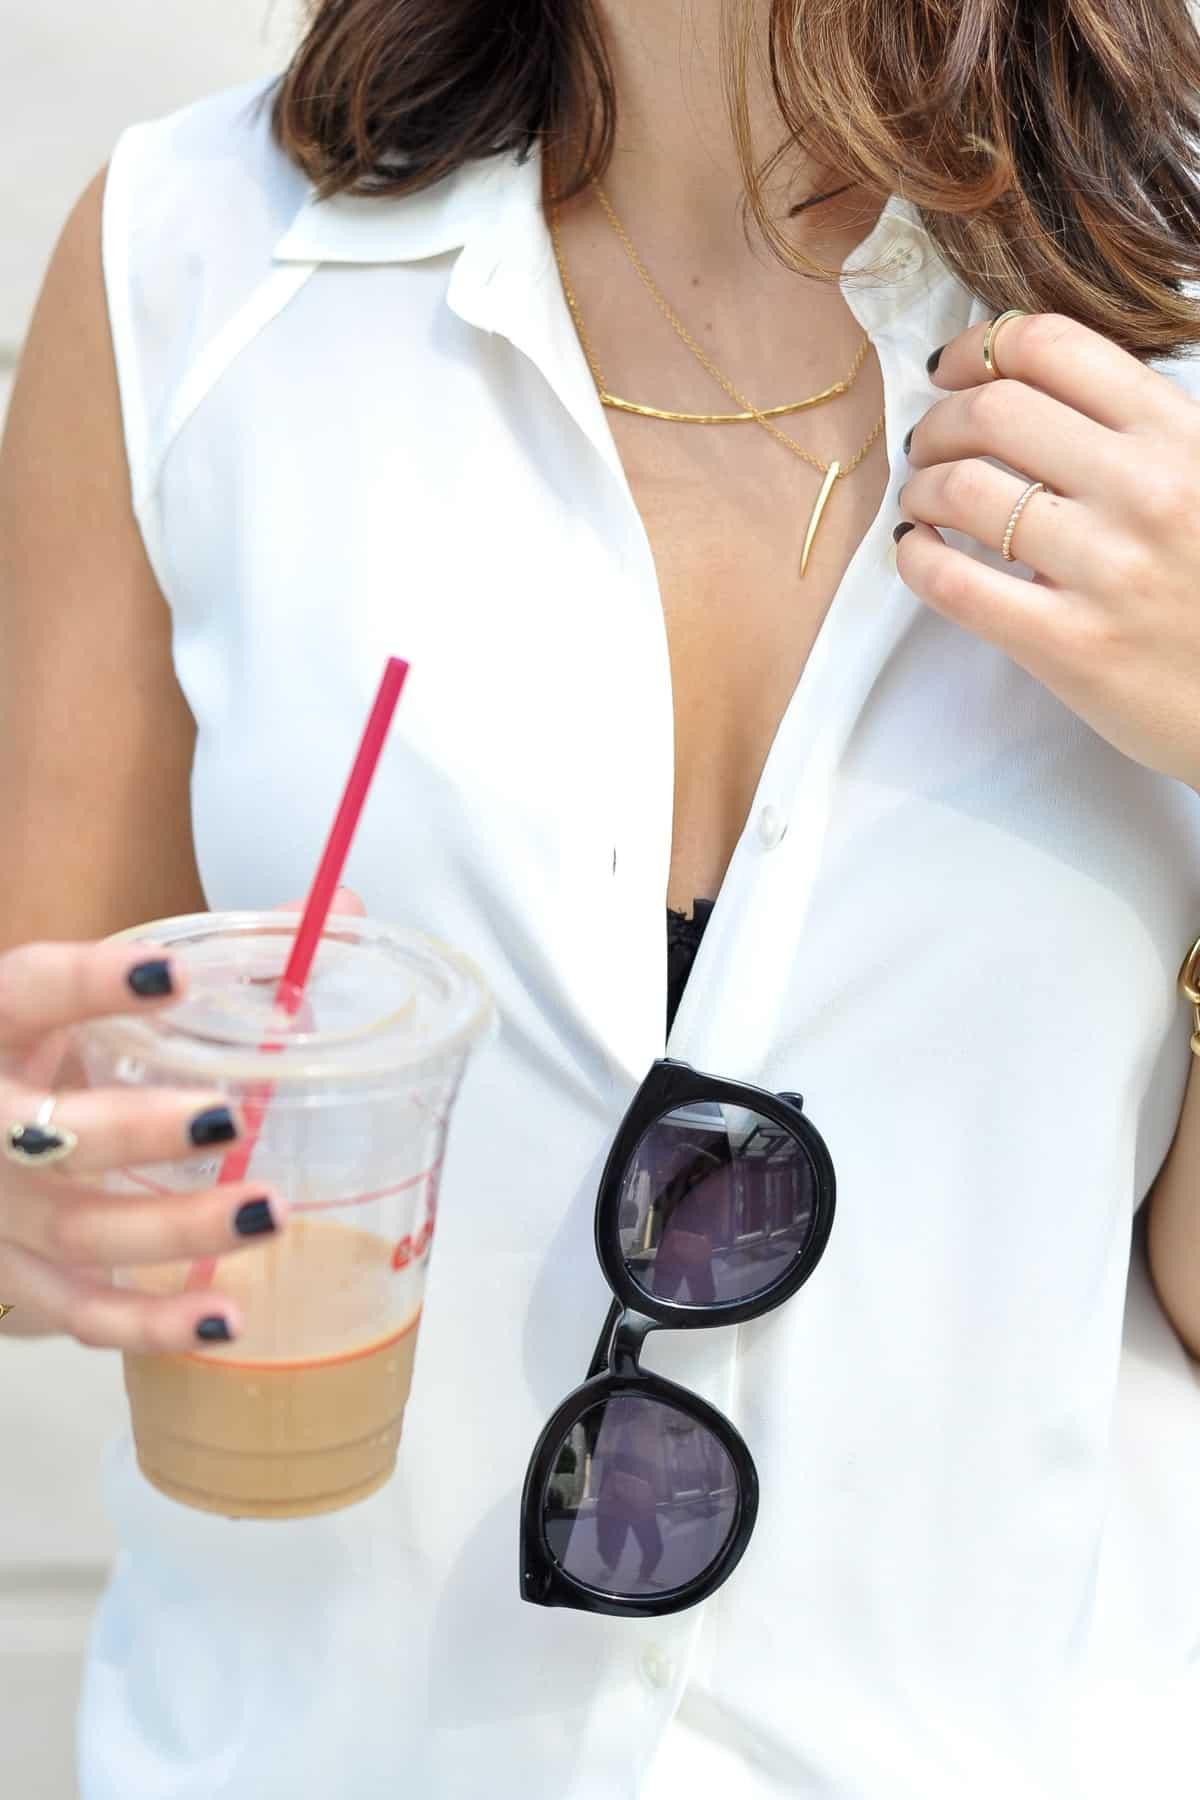 white button down and black lace bra via @mystylevita [My Style Vita]